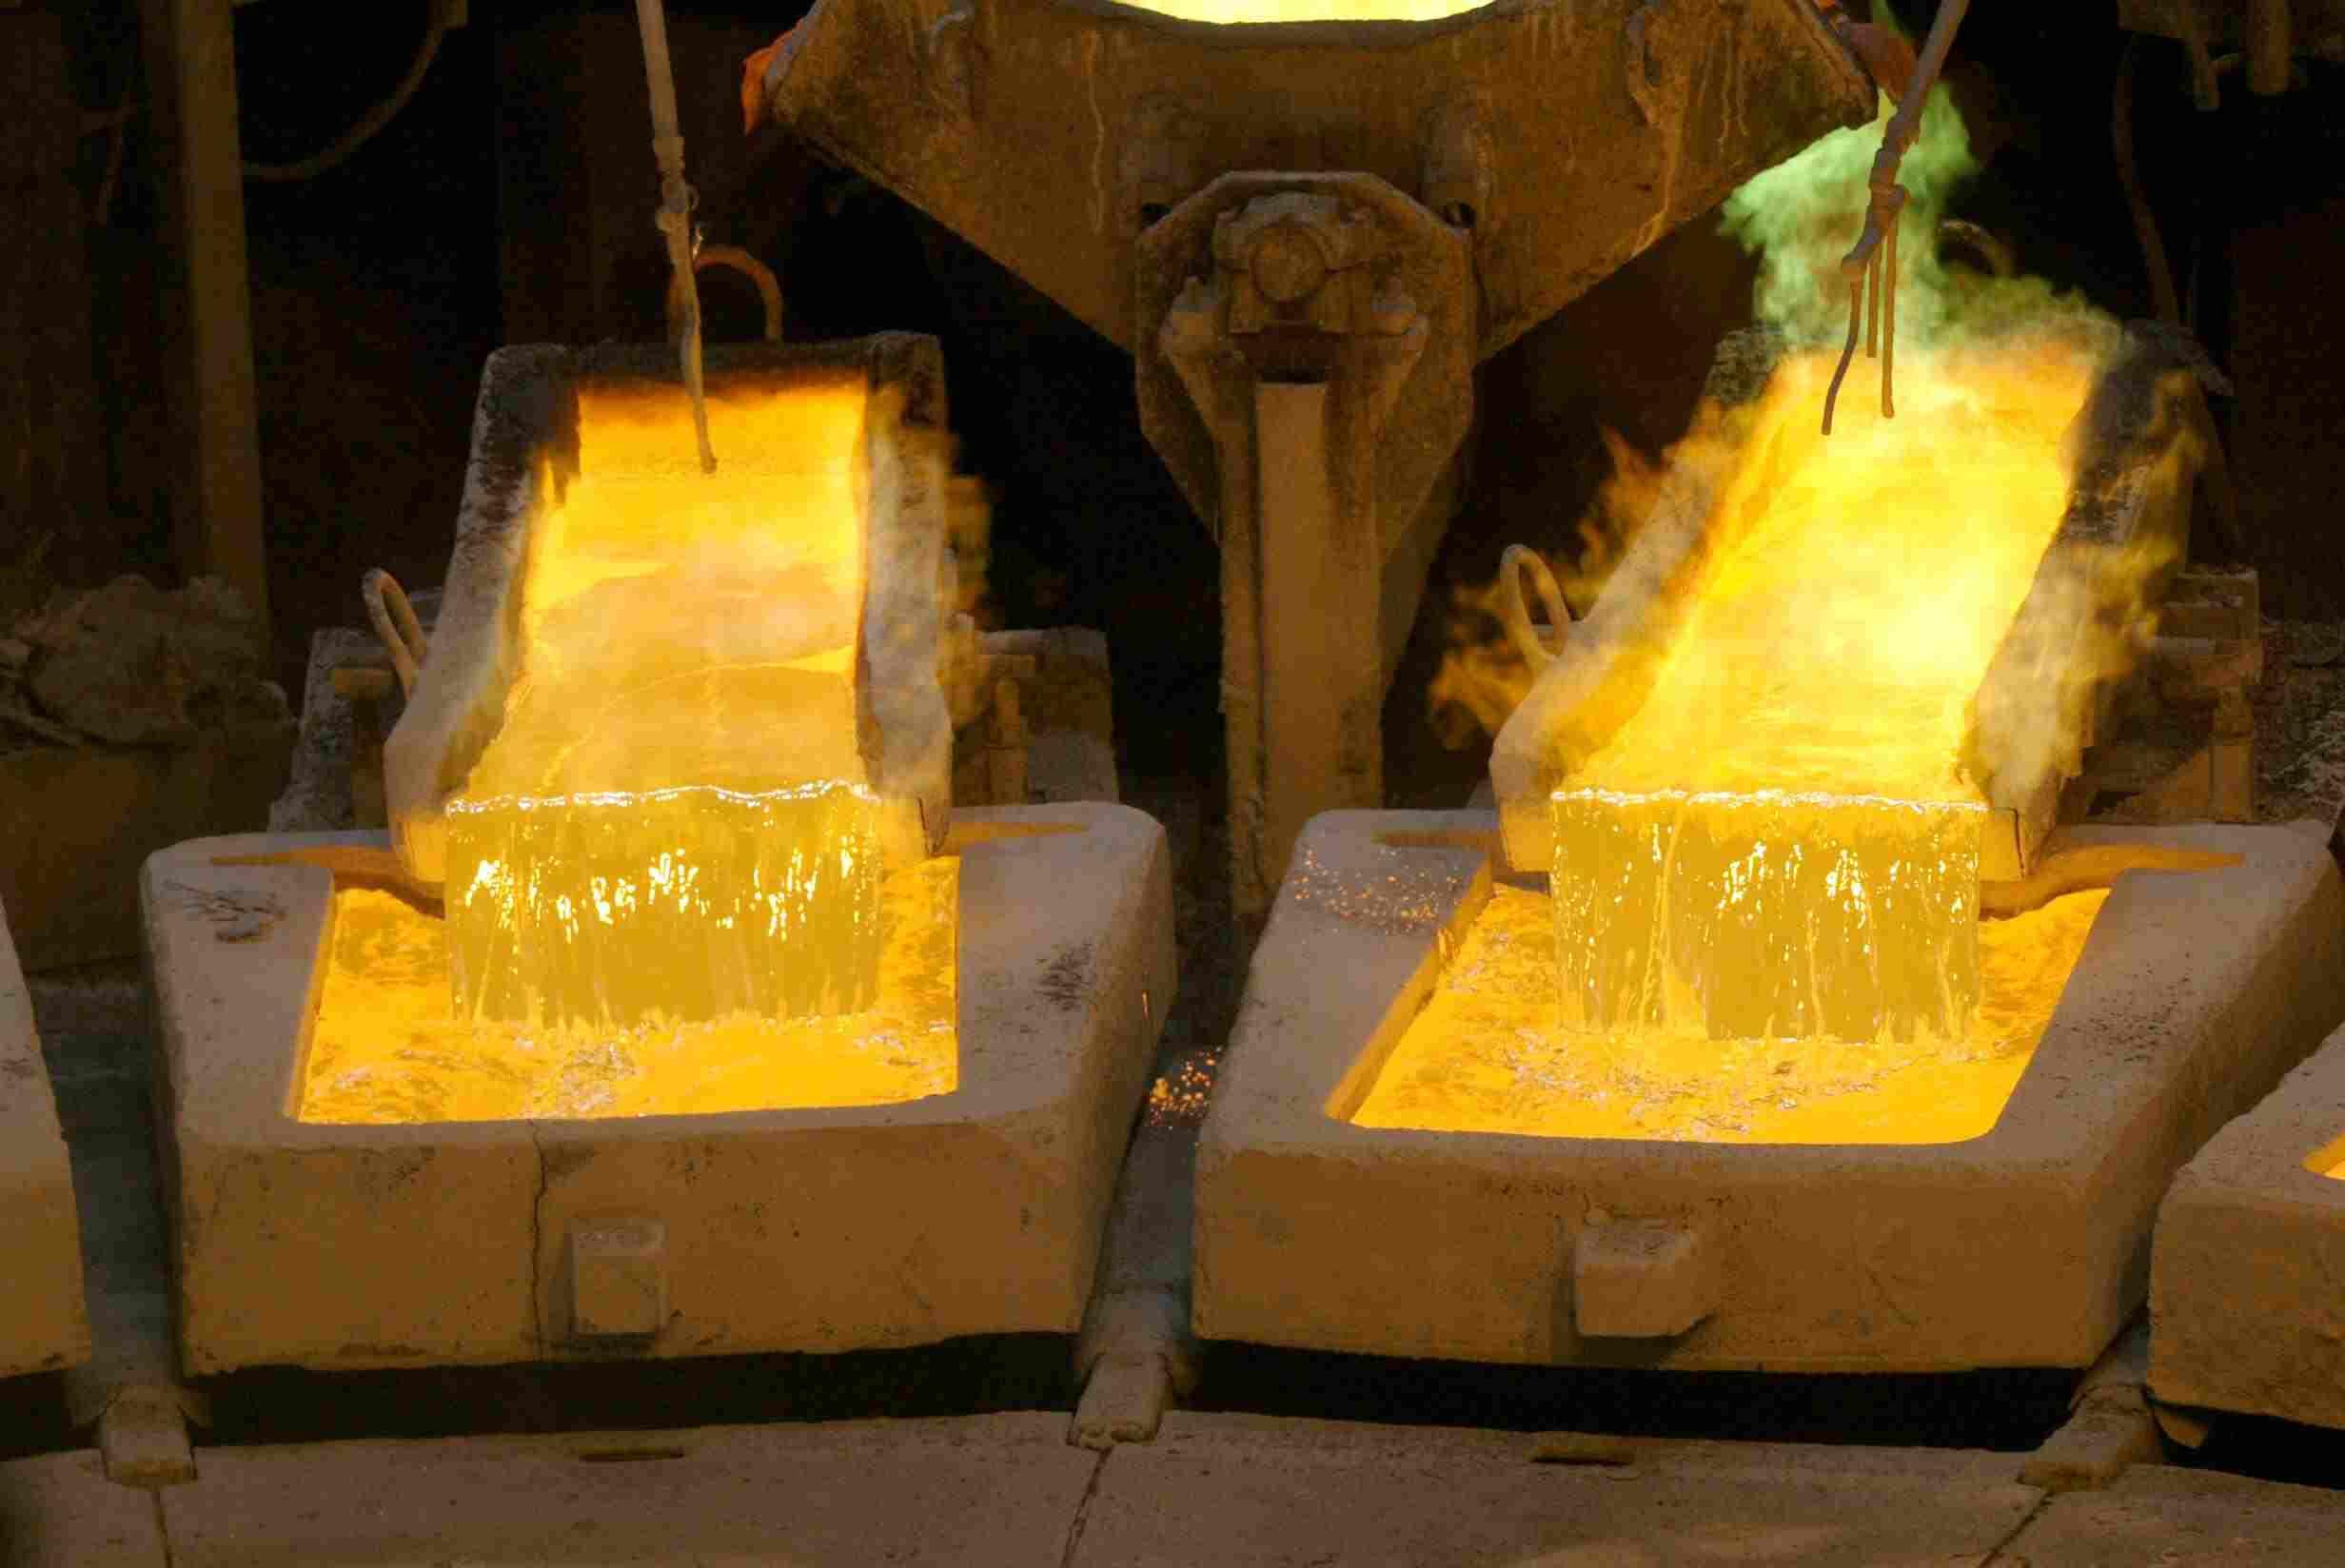 Asuntos corporativos de júniors: Lundin, Golden Arrow y Aura Minerals